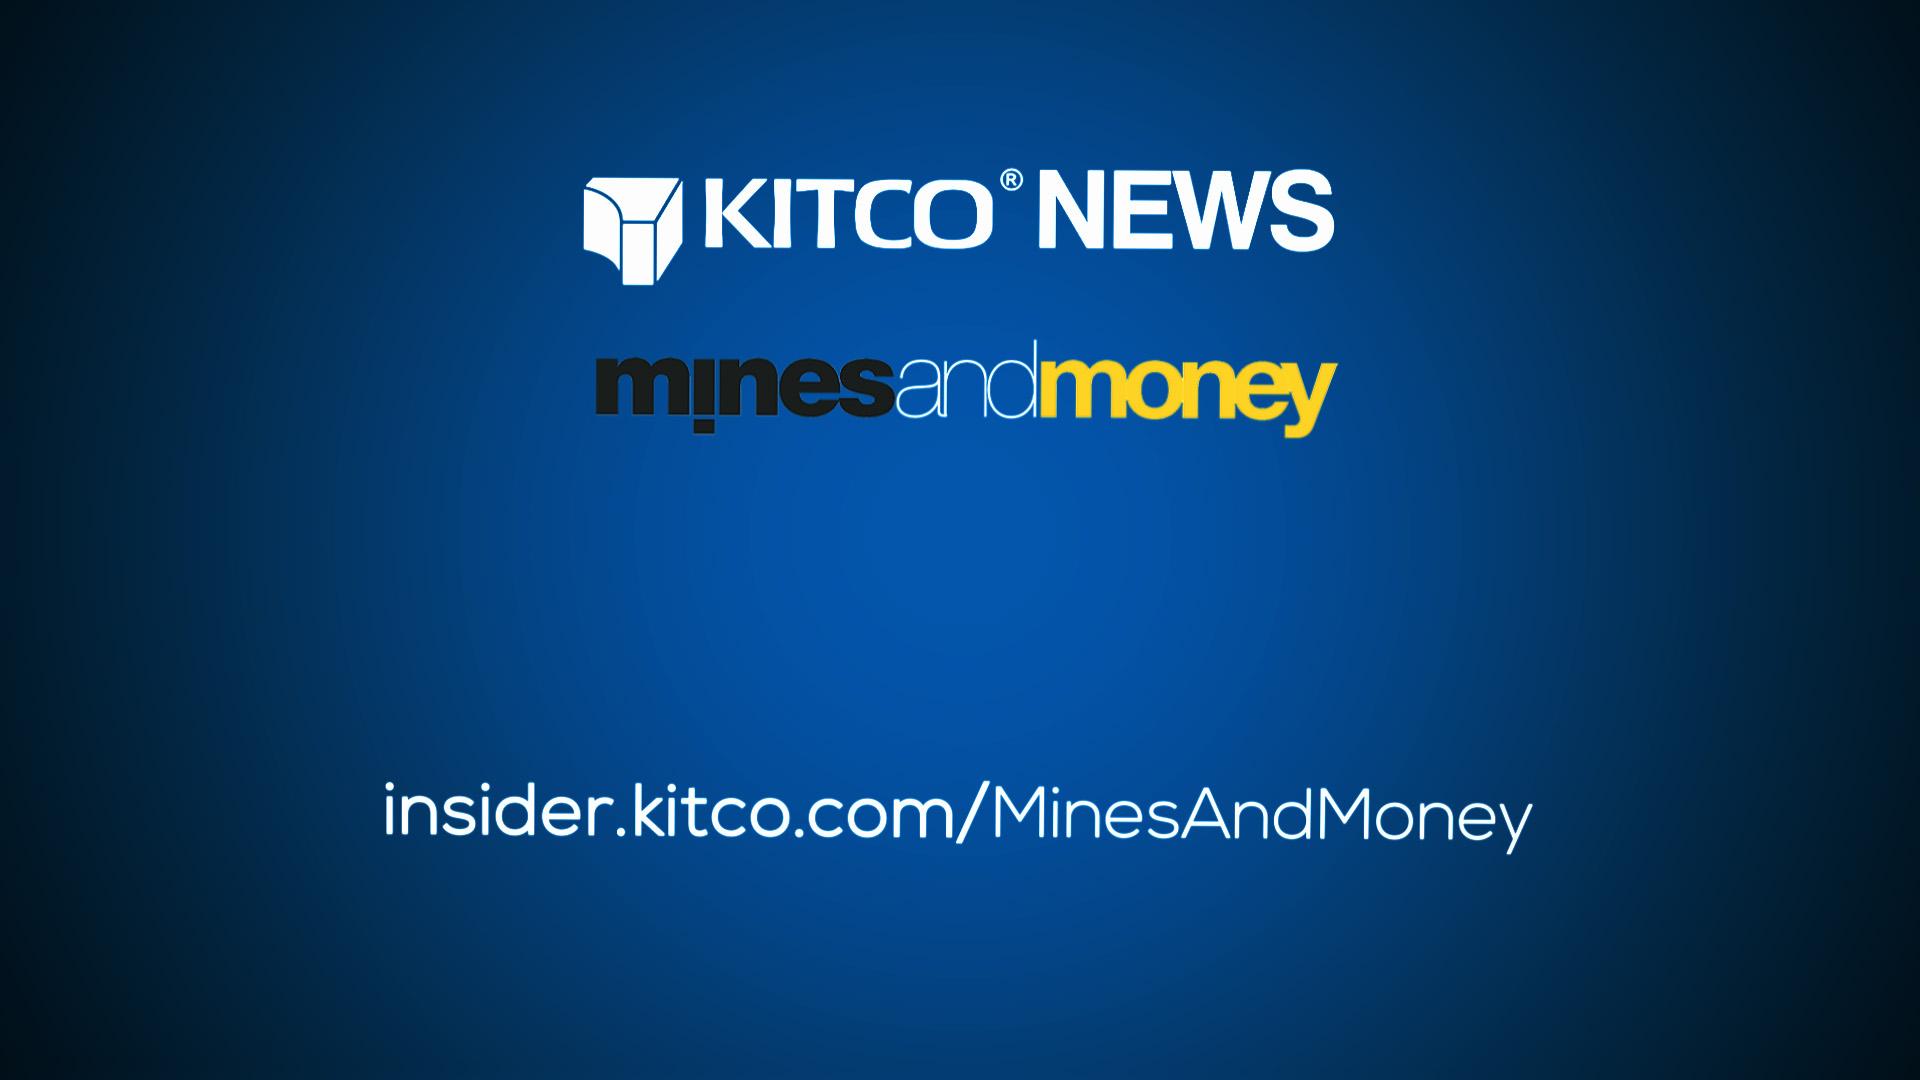 kitco news exclusive livestream